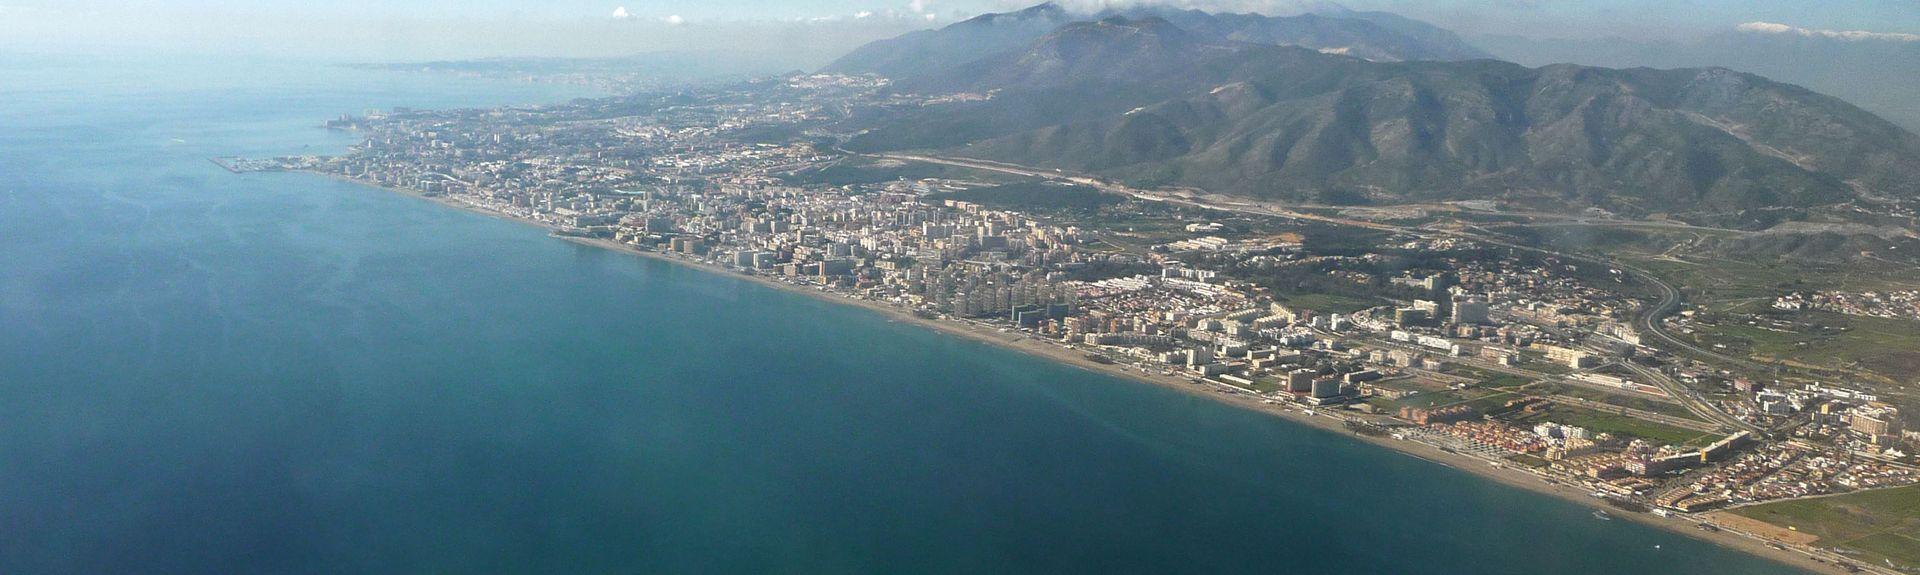 Malagas hamn, Málaga, Andalusien, Spanien